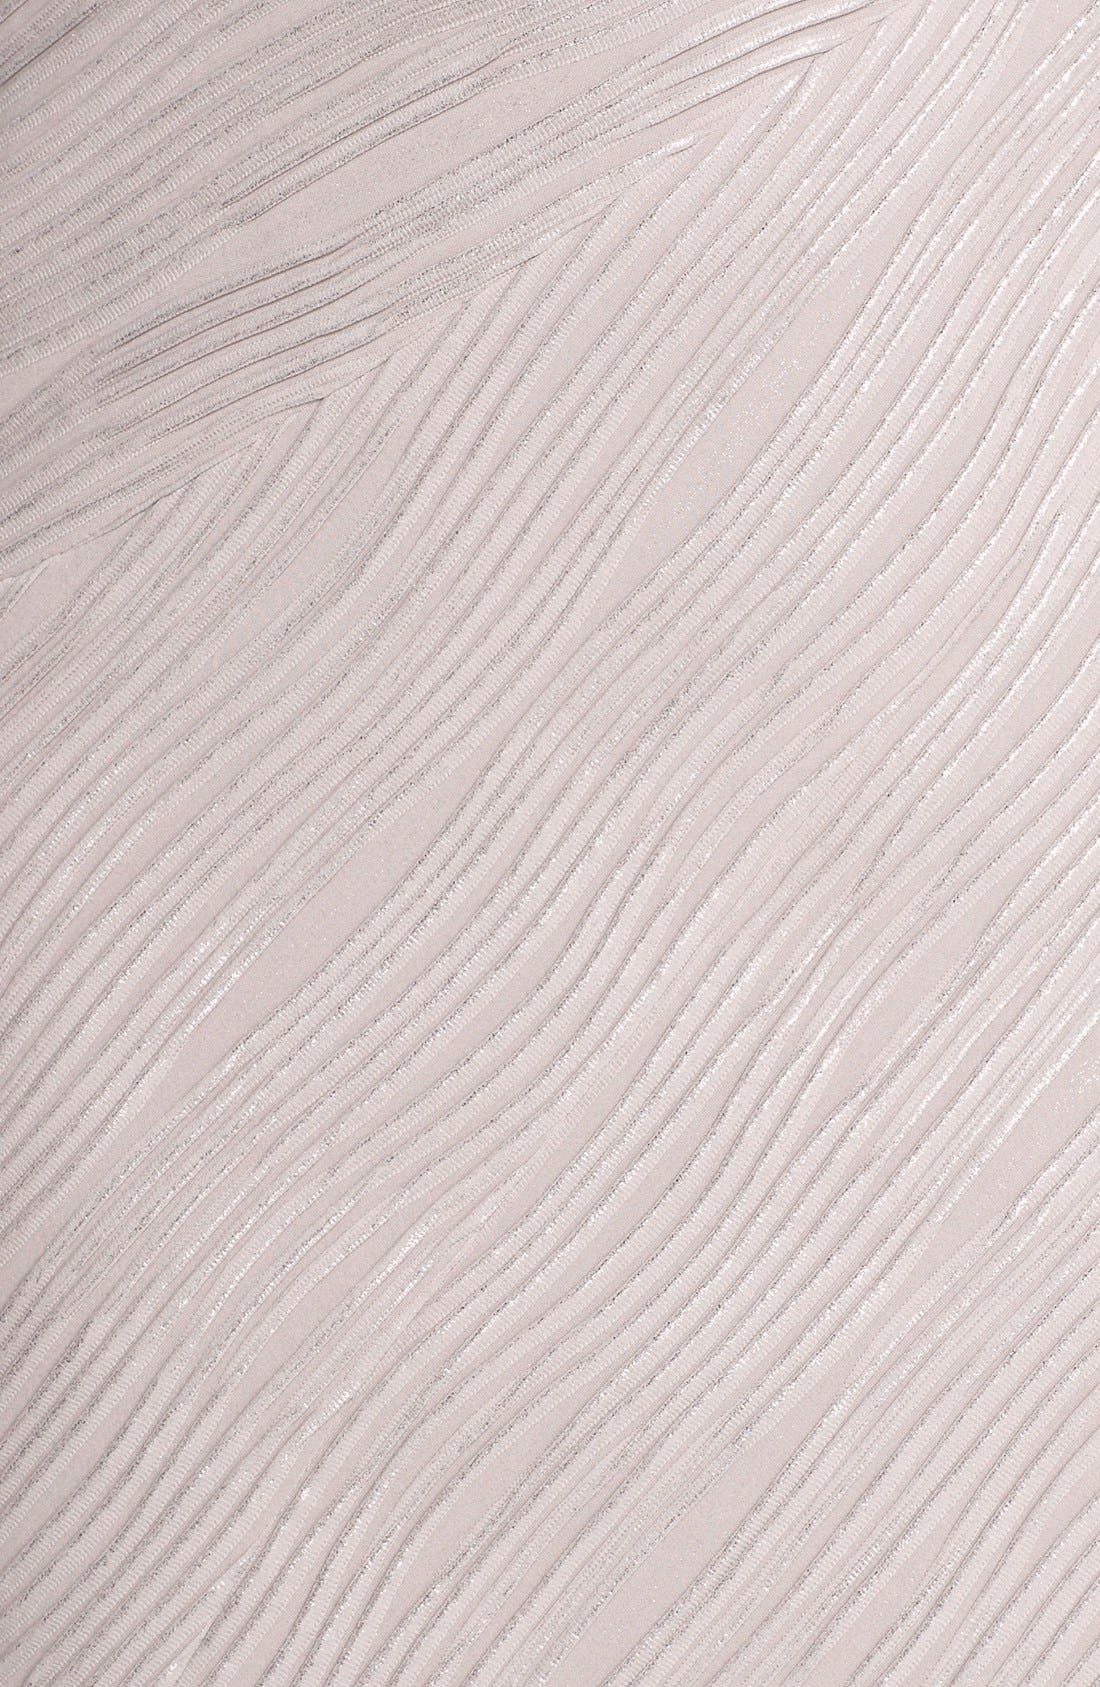 Embellished Sleeve Knit Sheath Dress,                             Alternate thumbnail 6, color,                             Taupe